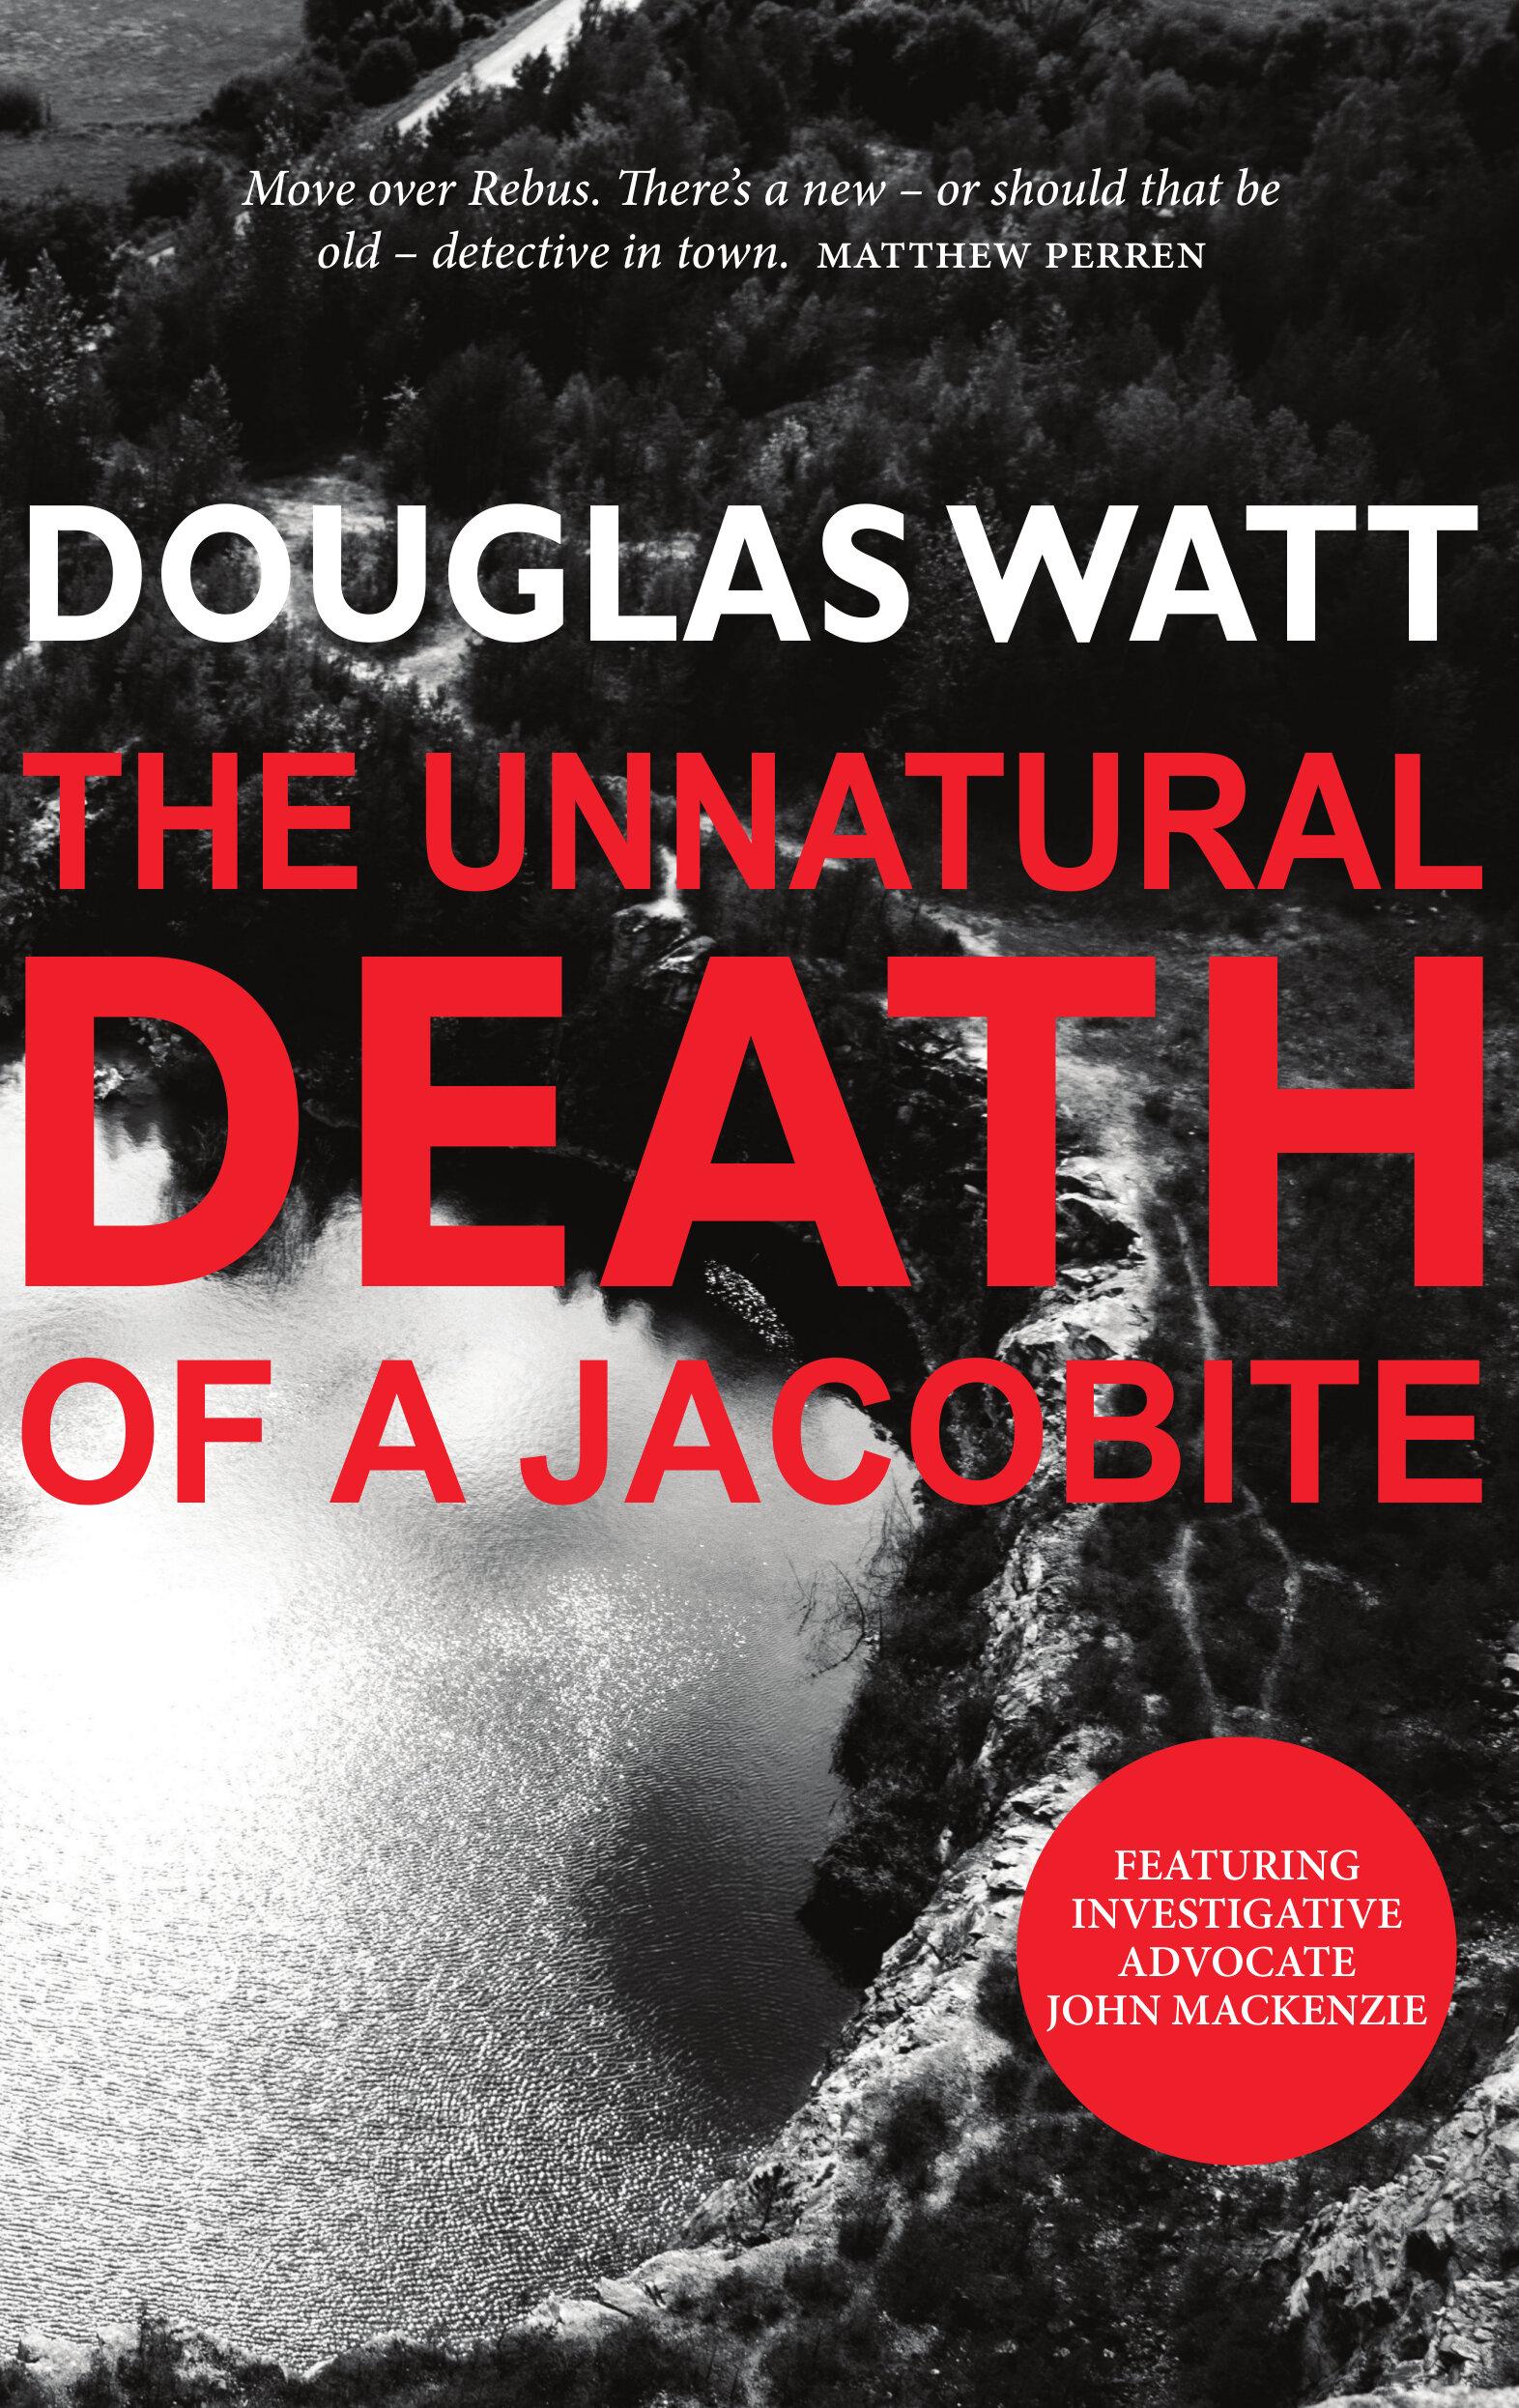 Unnatural Death of a Chief Douglas Watt 9781912147618 Luath Press.jpg